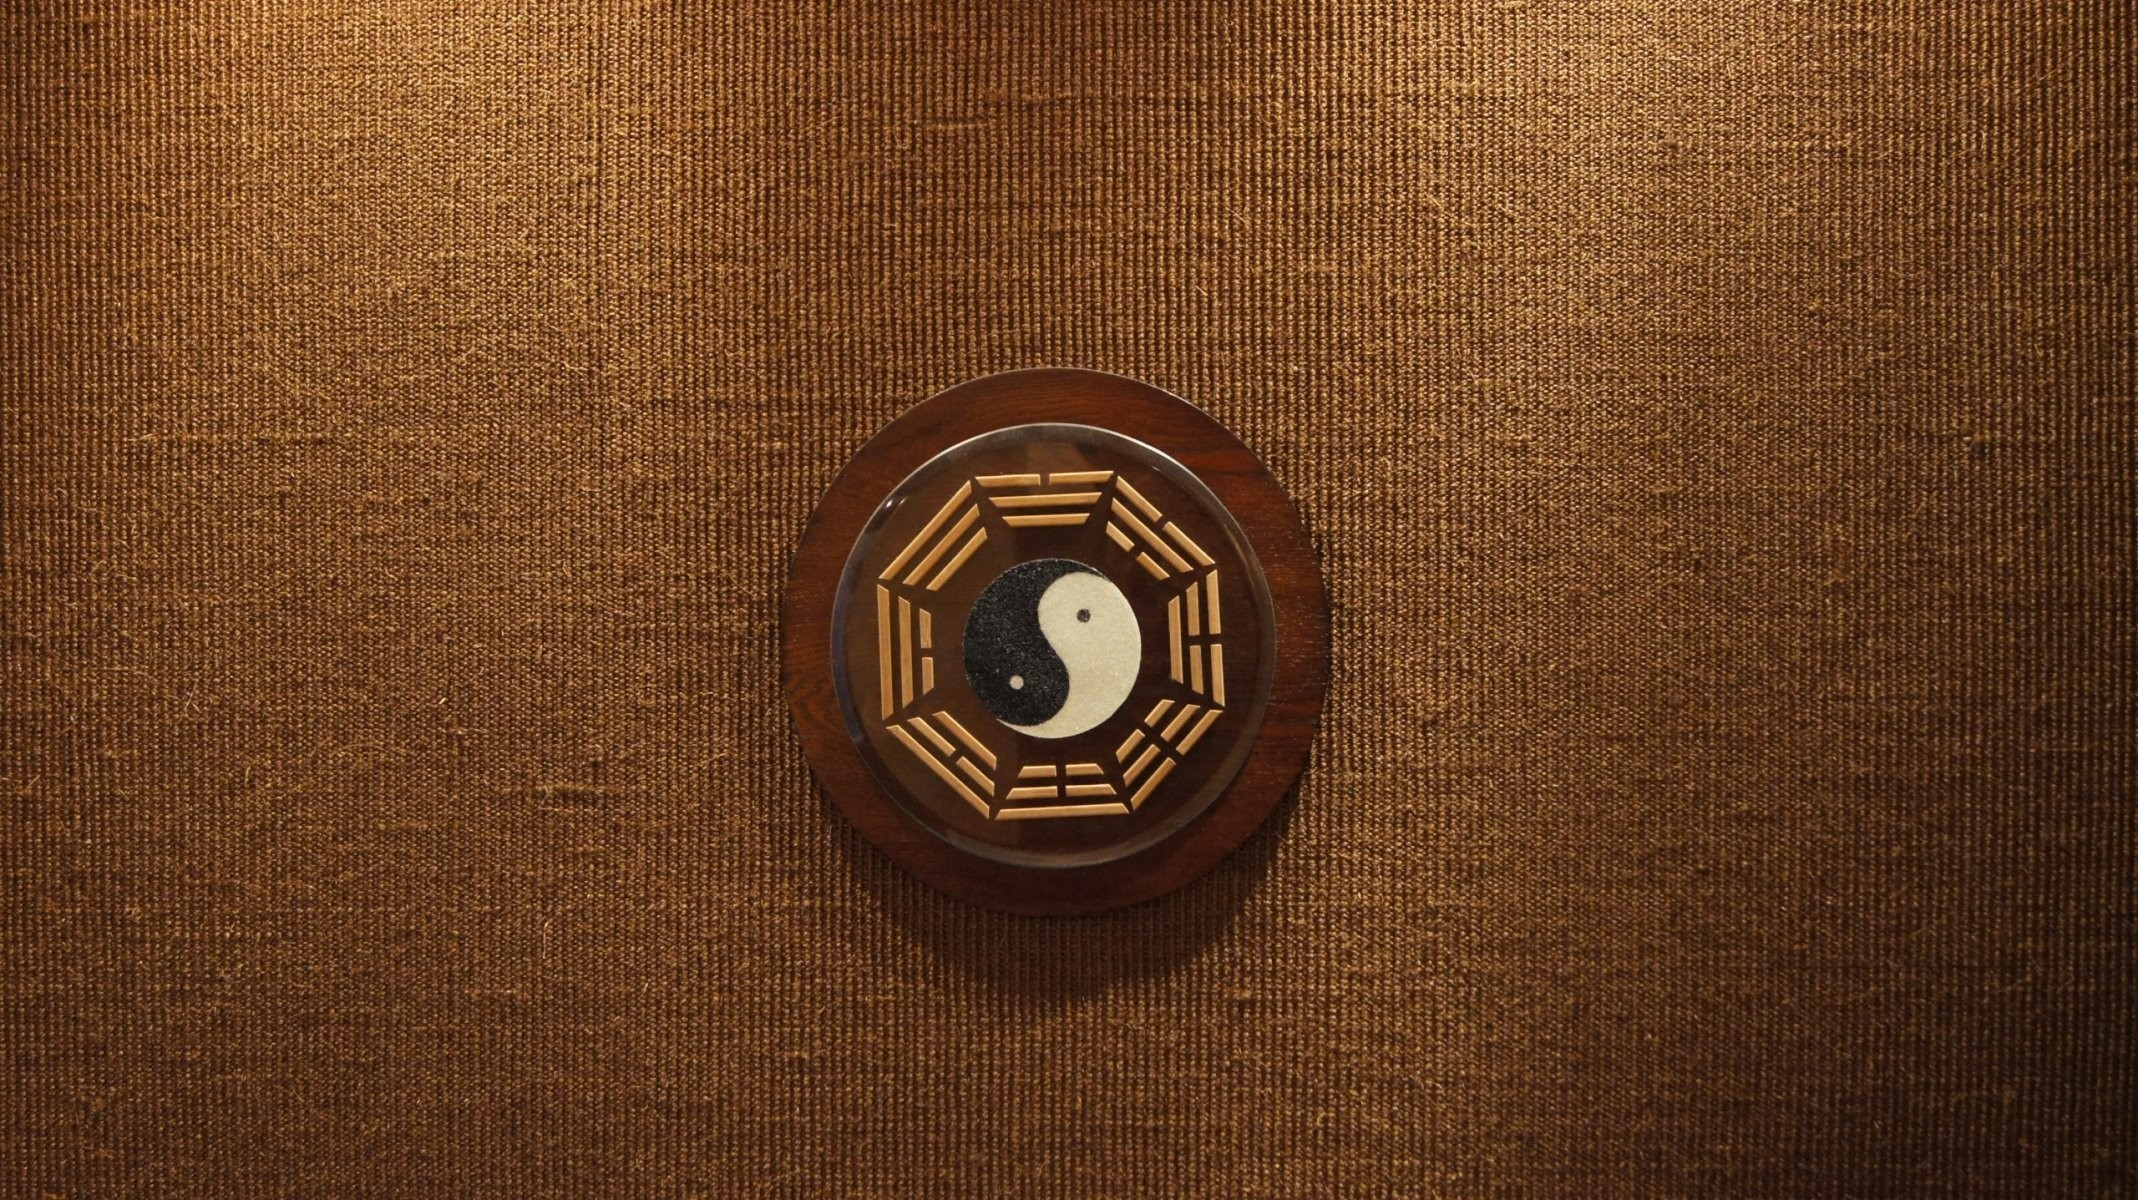 textures background tree yin-yang mark symbol beige brown